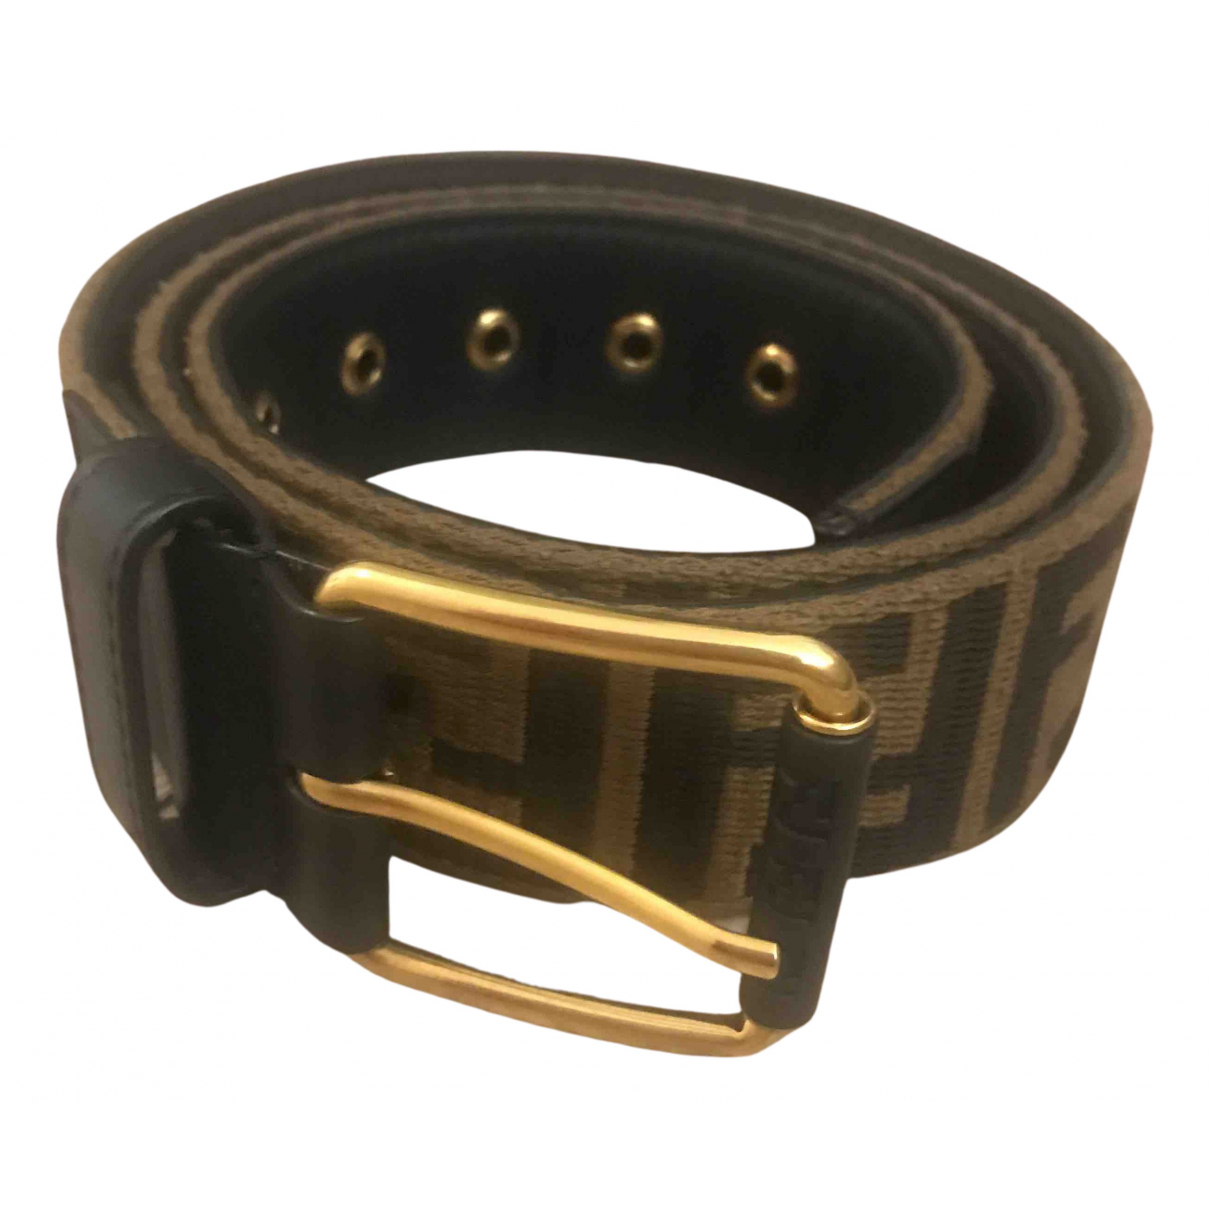 Fendi N Beige Cloth belt for Women 95 cm